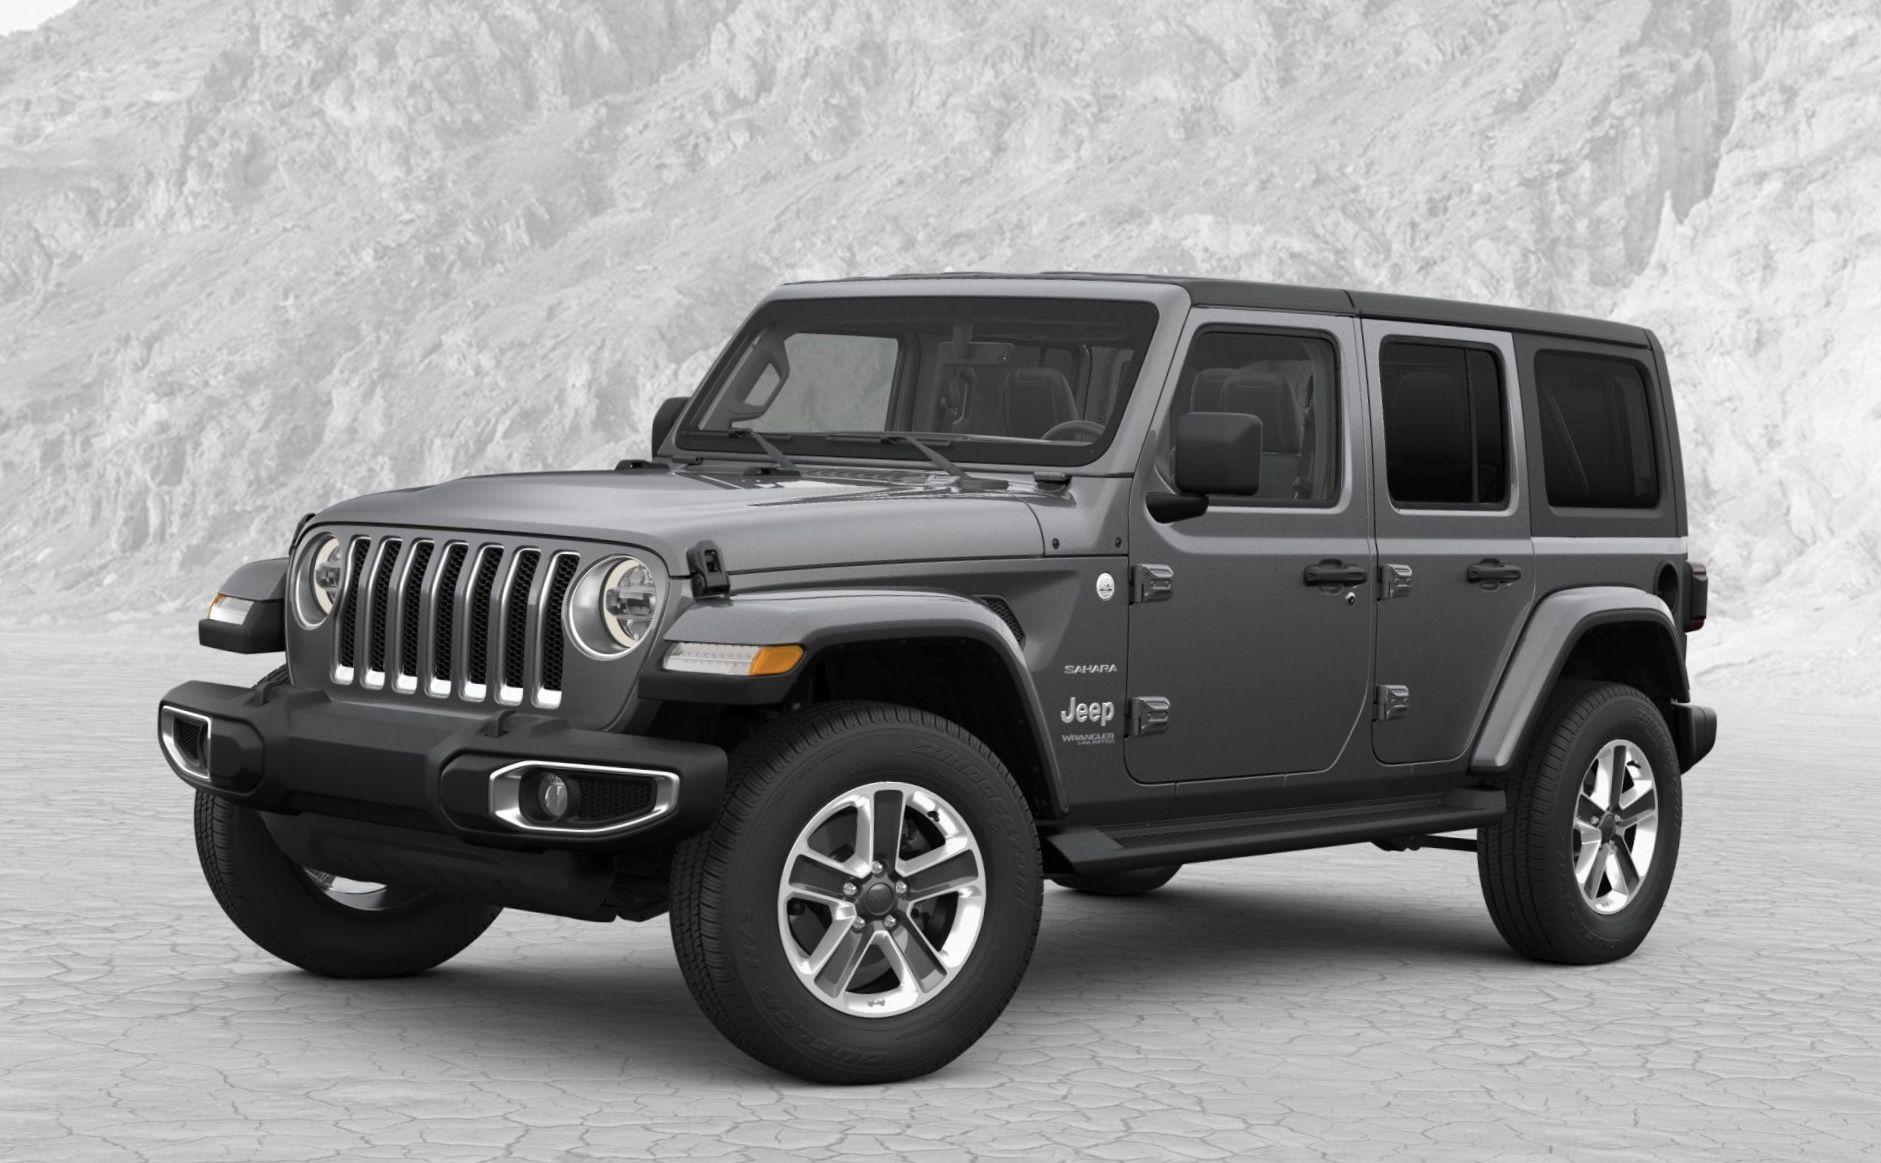 2016 Jeep Wrangler Freedom Edition In Granite Crystal 2016 Jeep Wrangler Jeep Wrangler Jeep